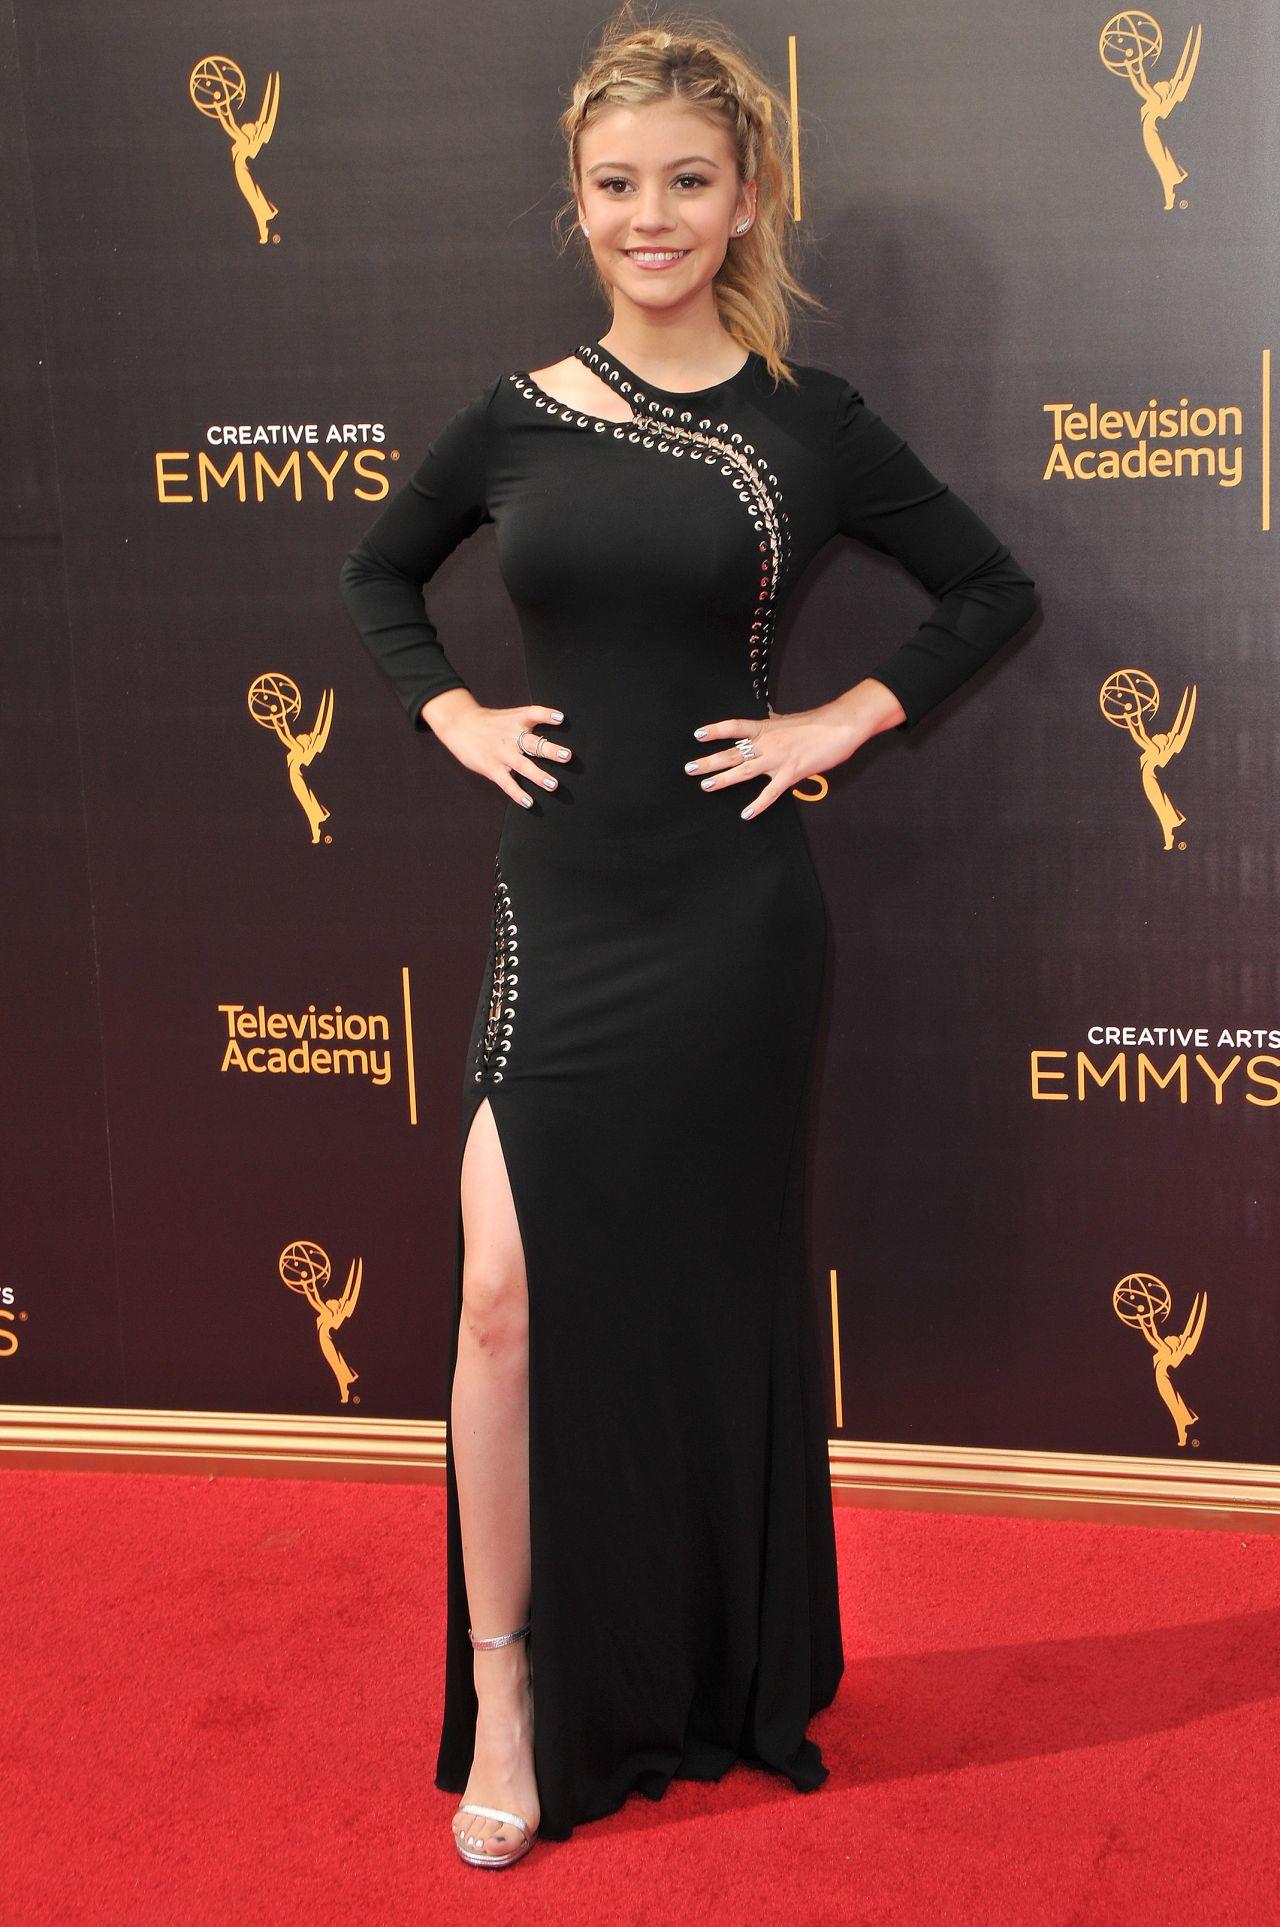 Genevieve Hannelius Creative Arts Emmys Awards In Los